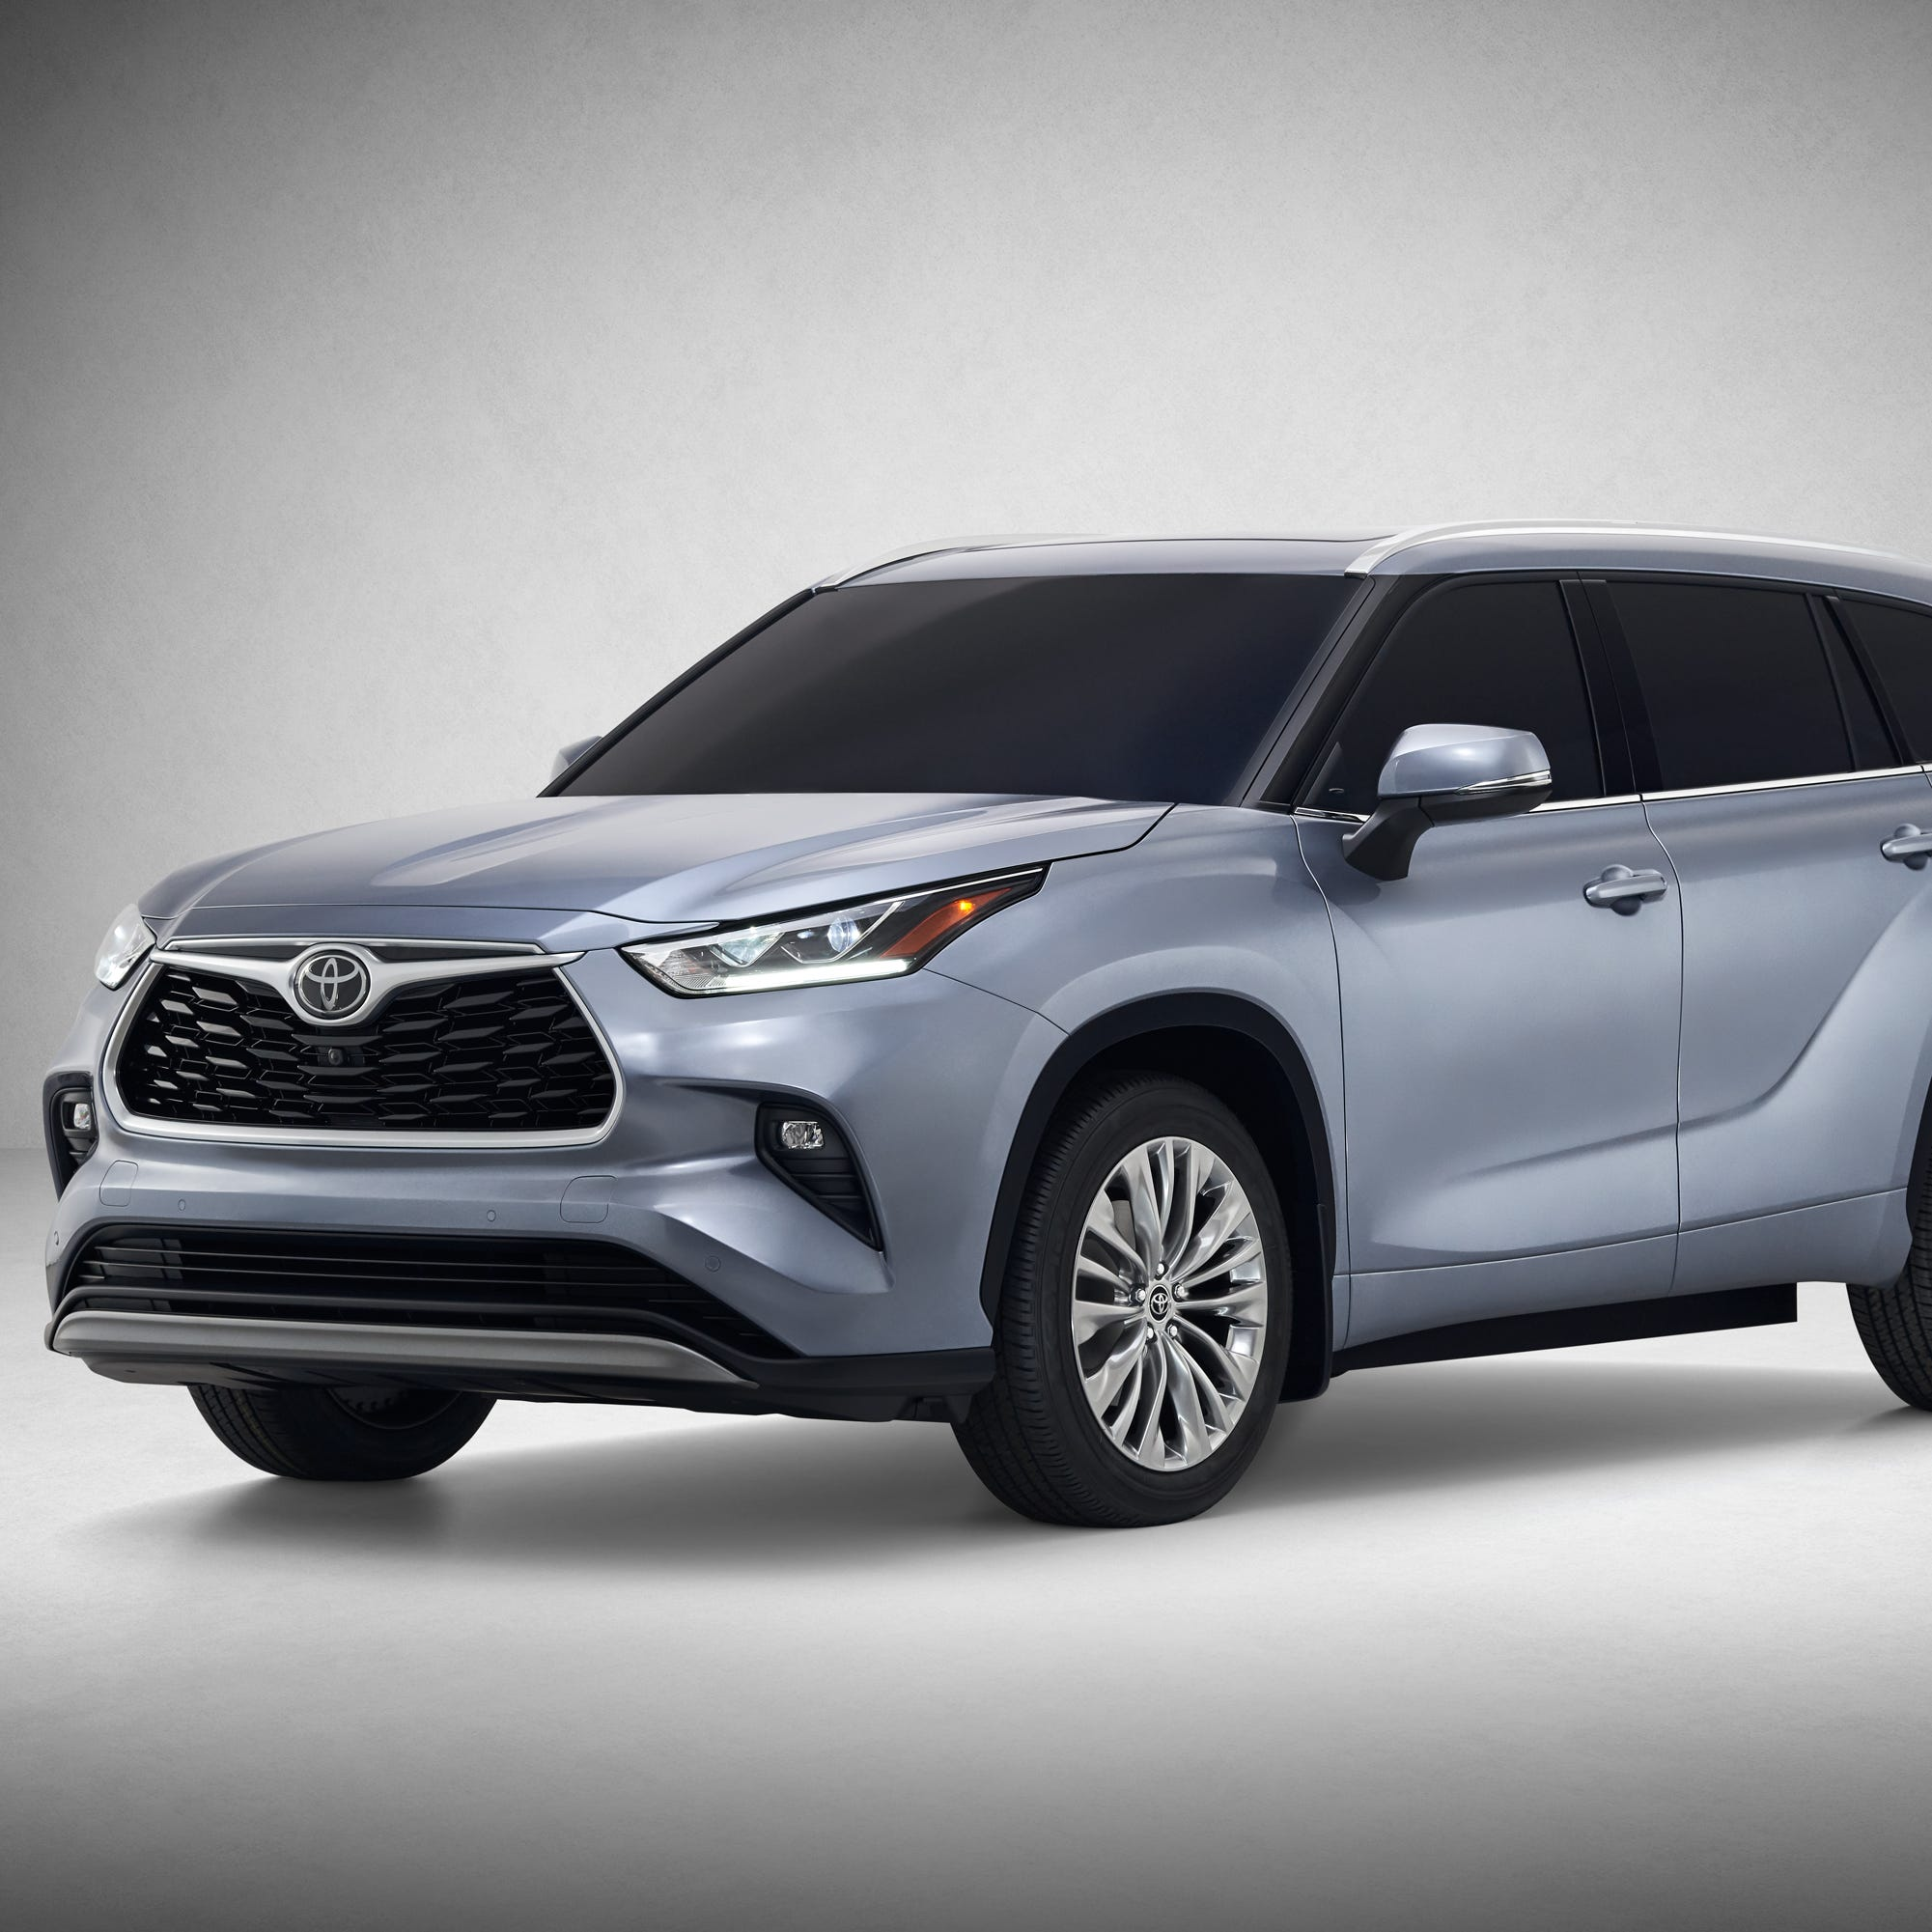 The 2020 Toyota Highlander.